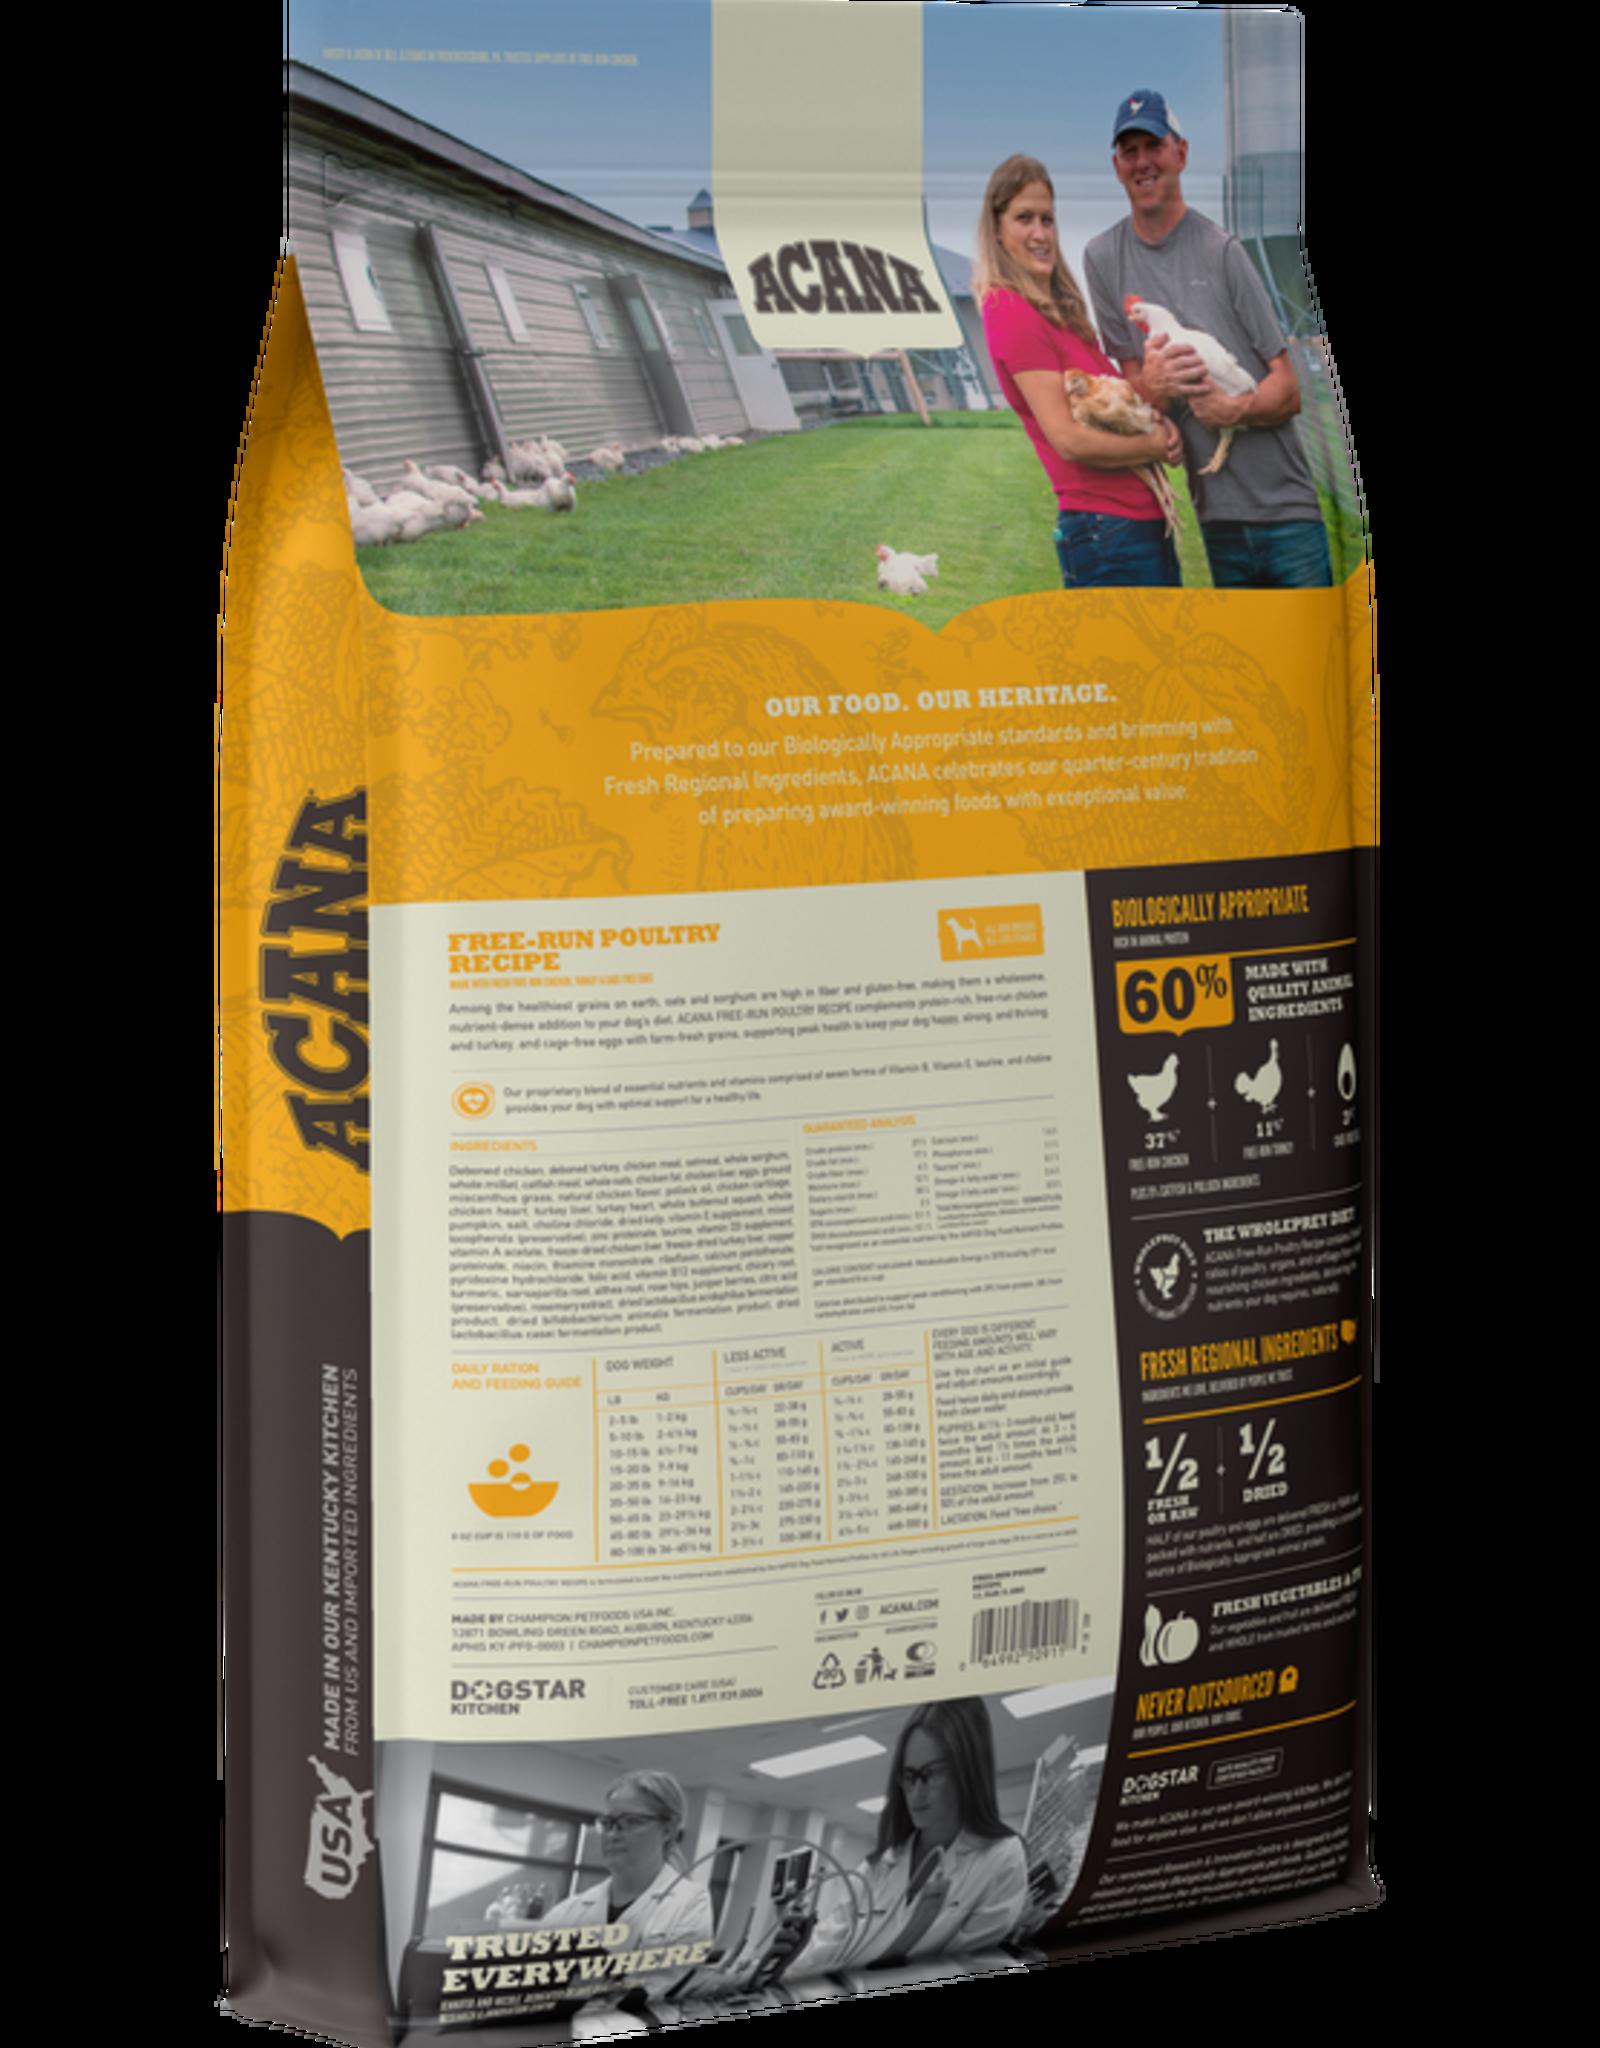 CHAMPION PET FOOD ACANA POULTRY & GRAINS 11.5LBS